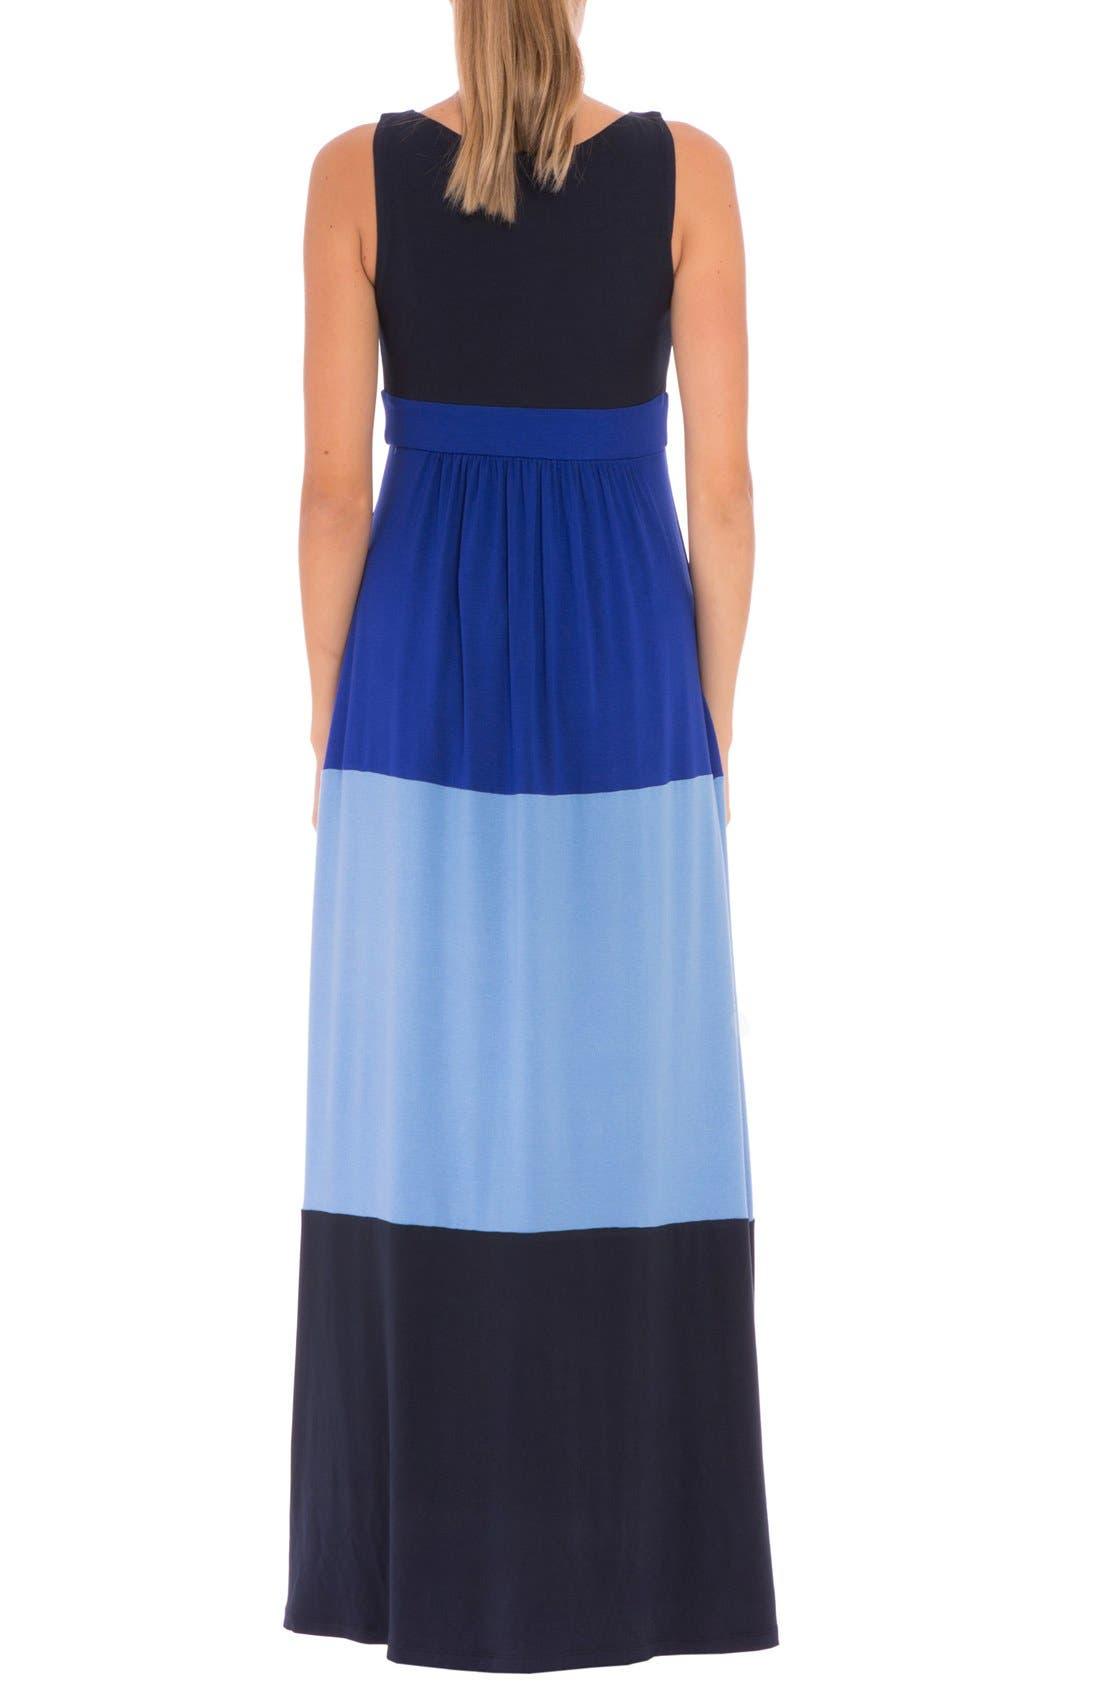 Alternate Image 2  - Olian 'Margarette' Colorblock Maternity Tank Dress